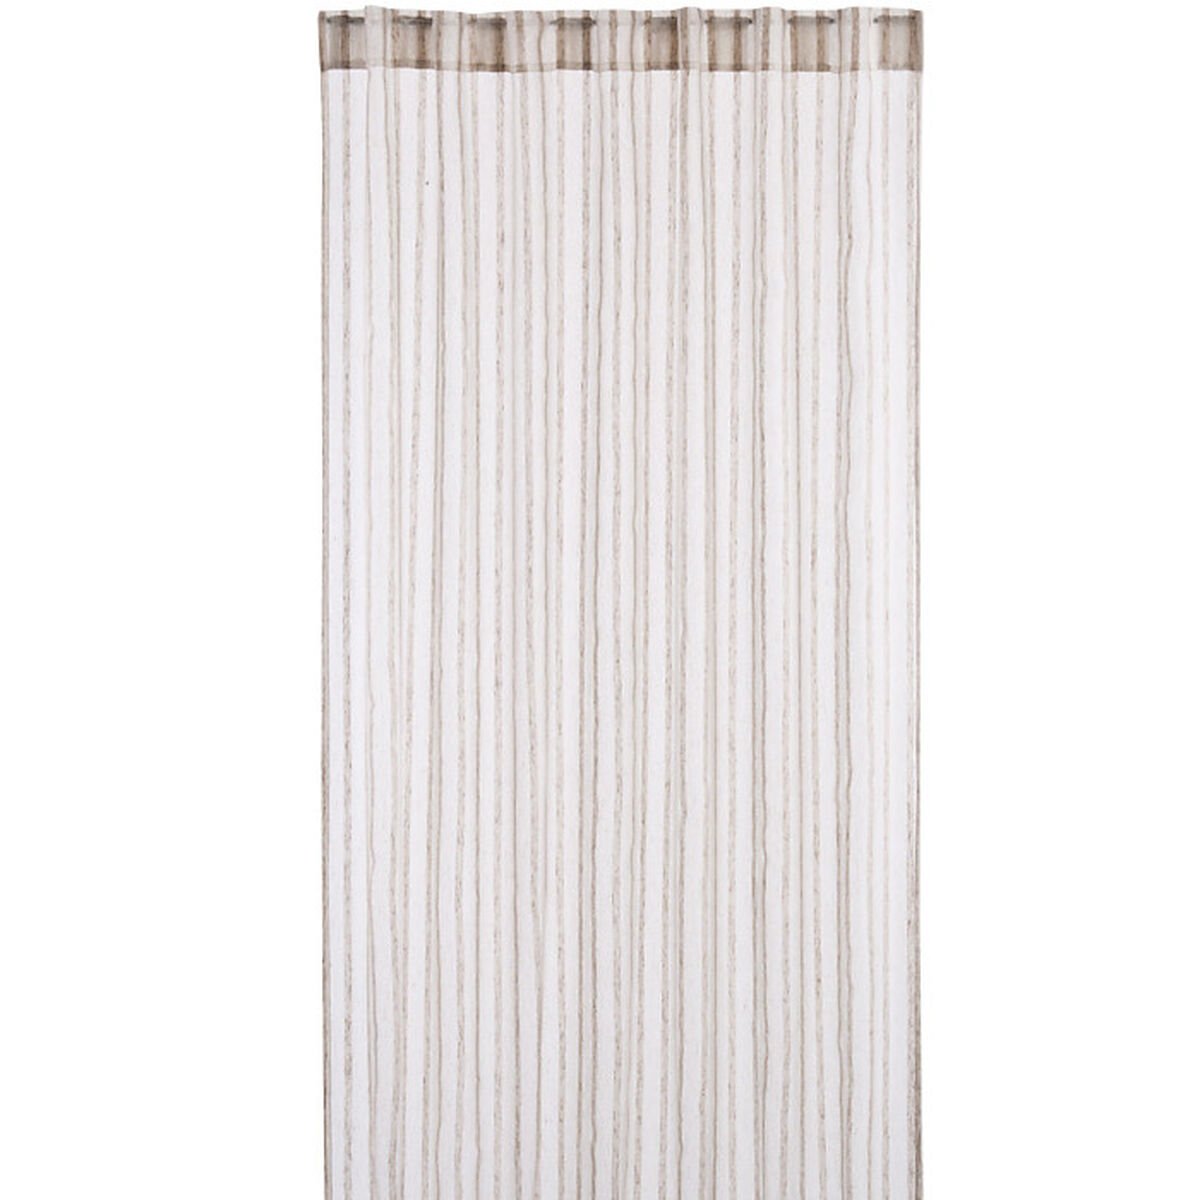 vorhang mit 8 verdeckten schlaufen polyester leinen natur ca b 140 x l 250 cm depot de. Black Bedroom Furniture Sets. Home Design Ideas